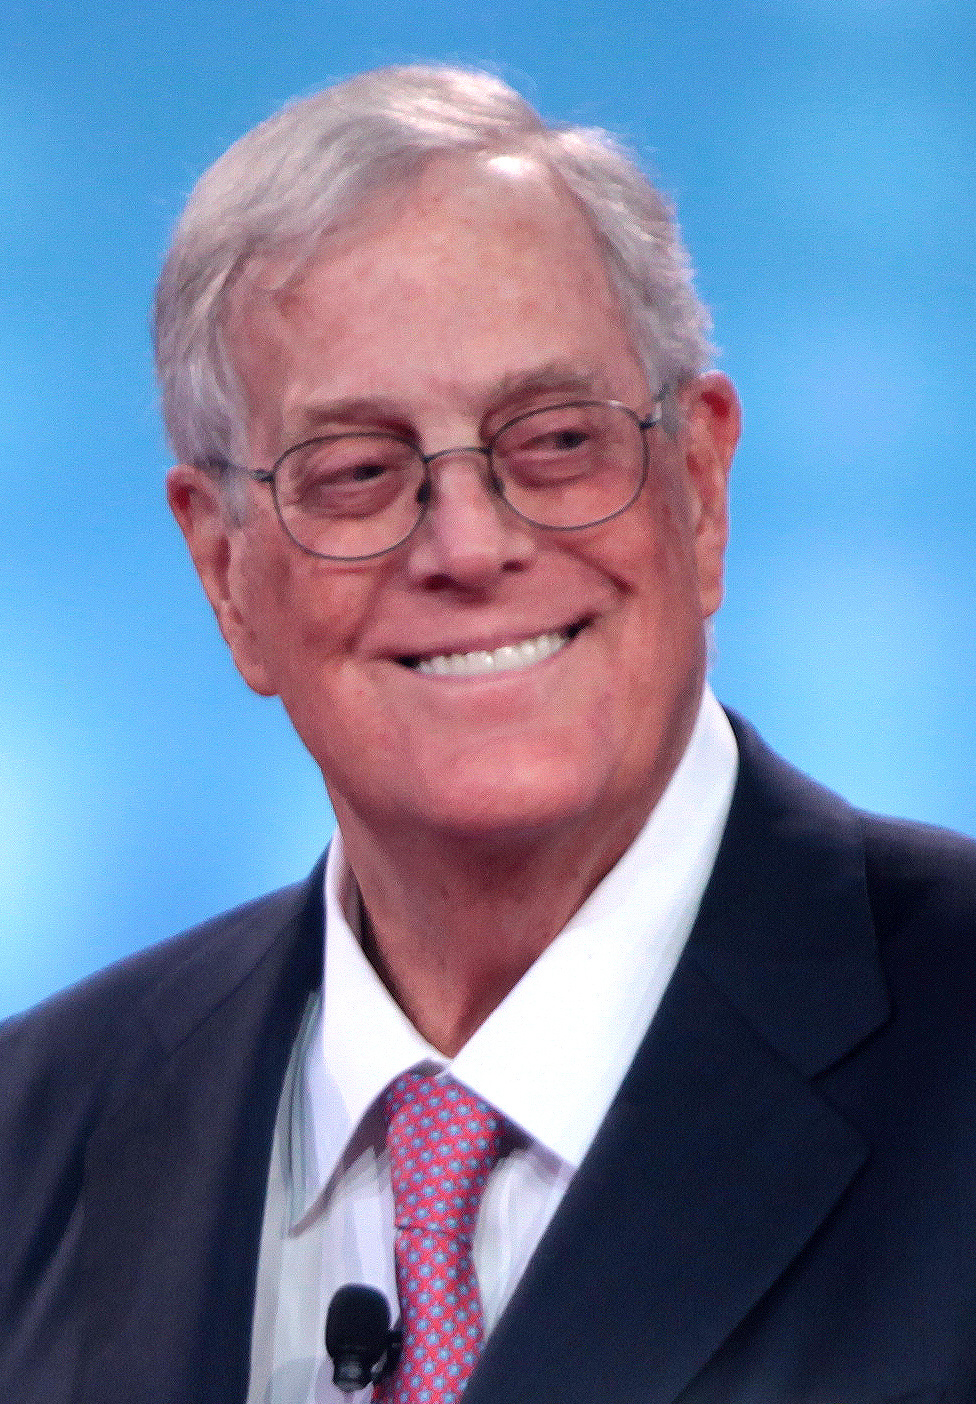 David Koch.  Wikipedia